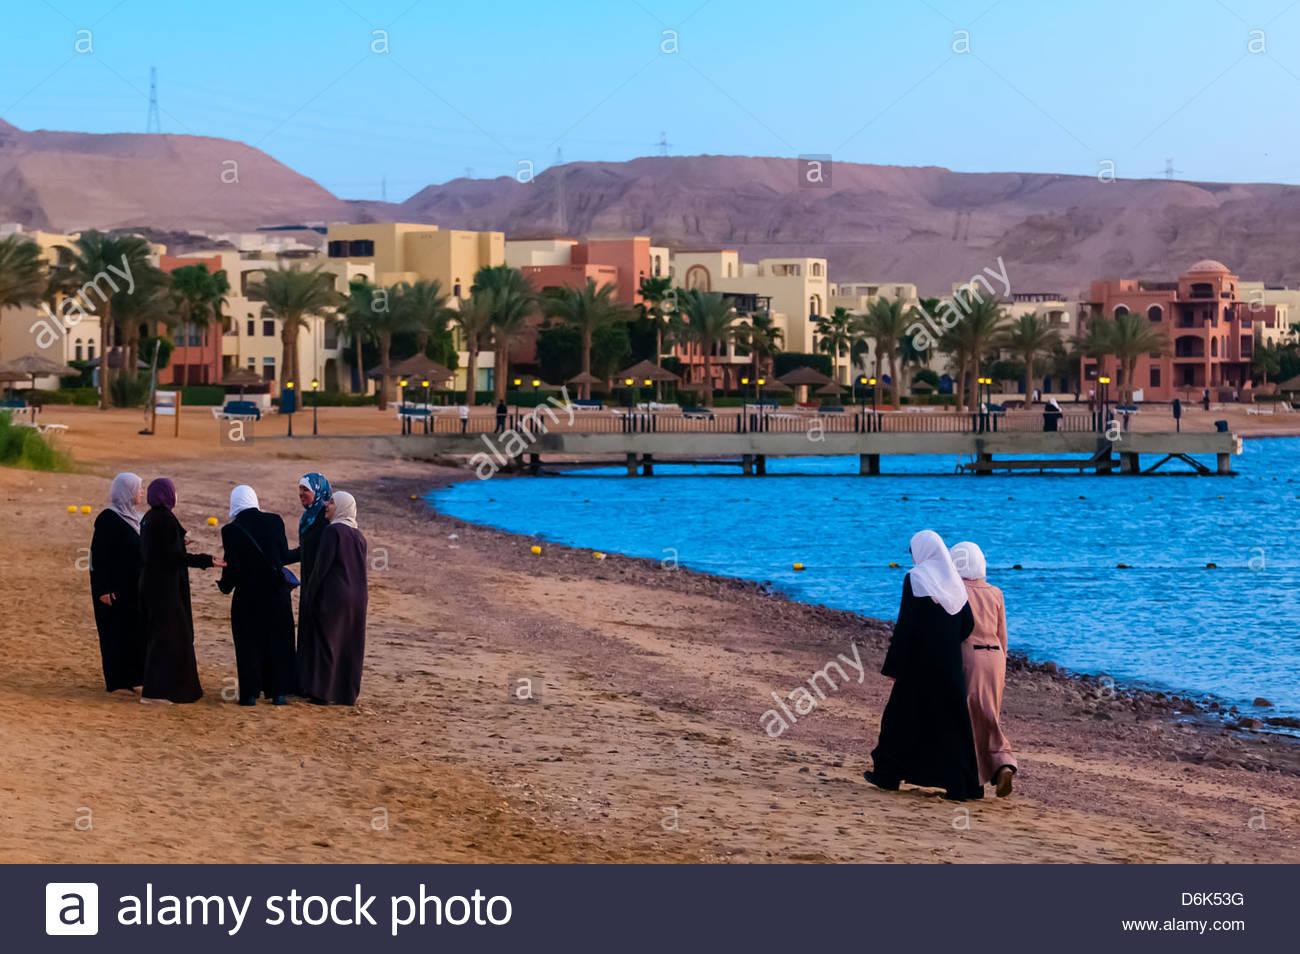 Arab women enjoying the beach at the Radisson Blu Tala Bay Resort on the Gulf of Aqaba, Red Sea, near Aqaba, Jordan - Stock Image